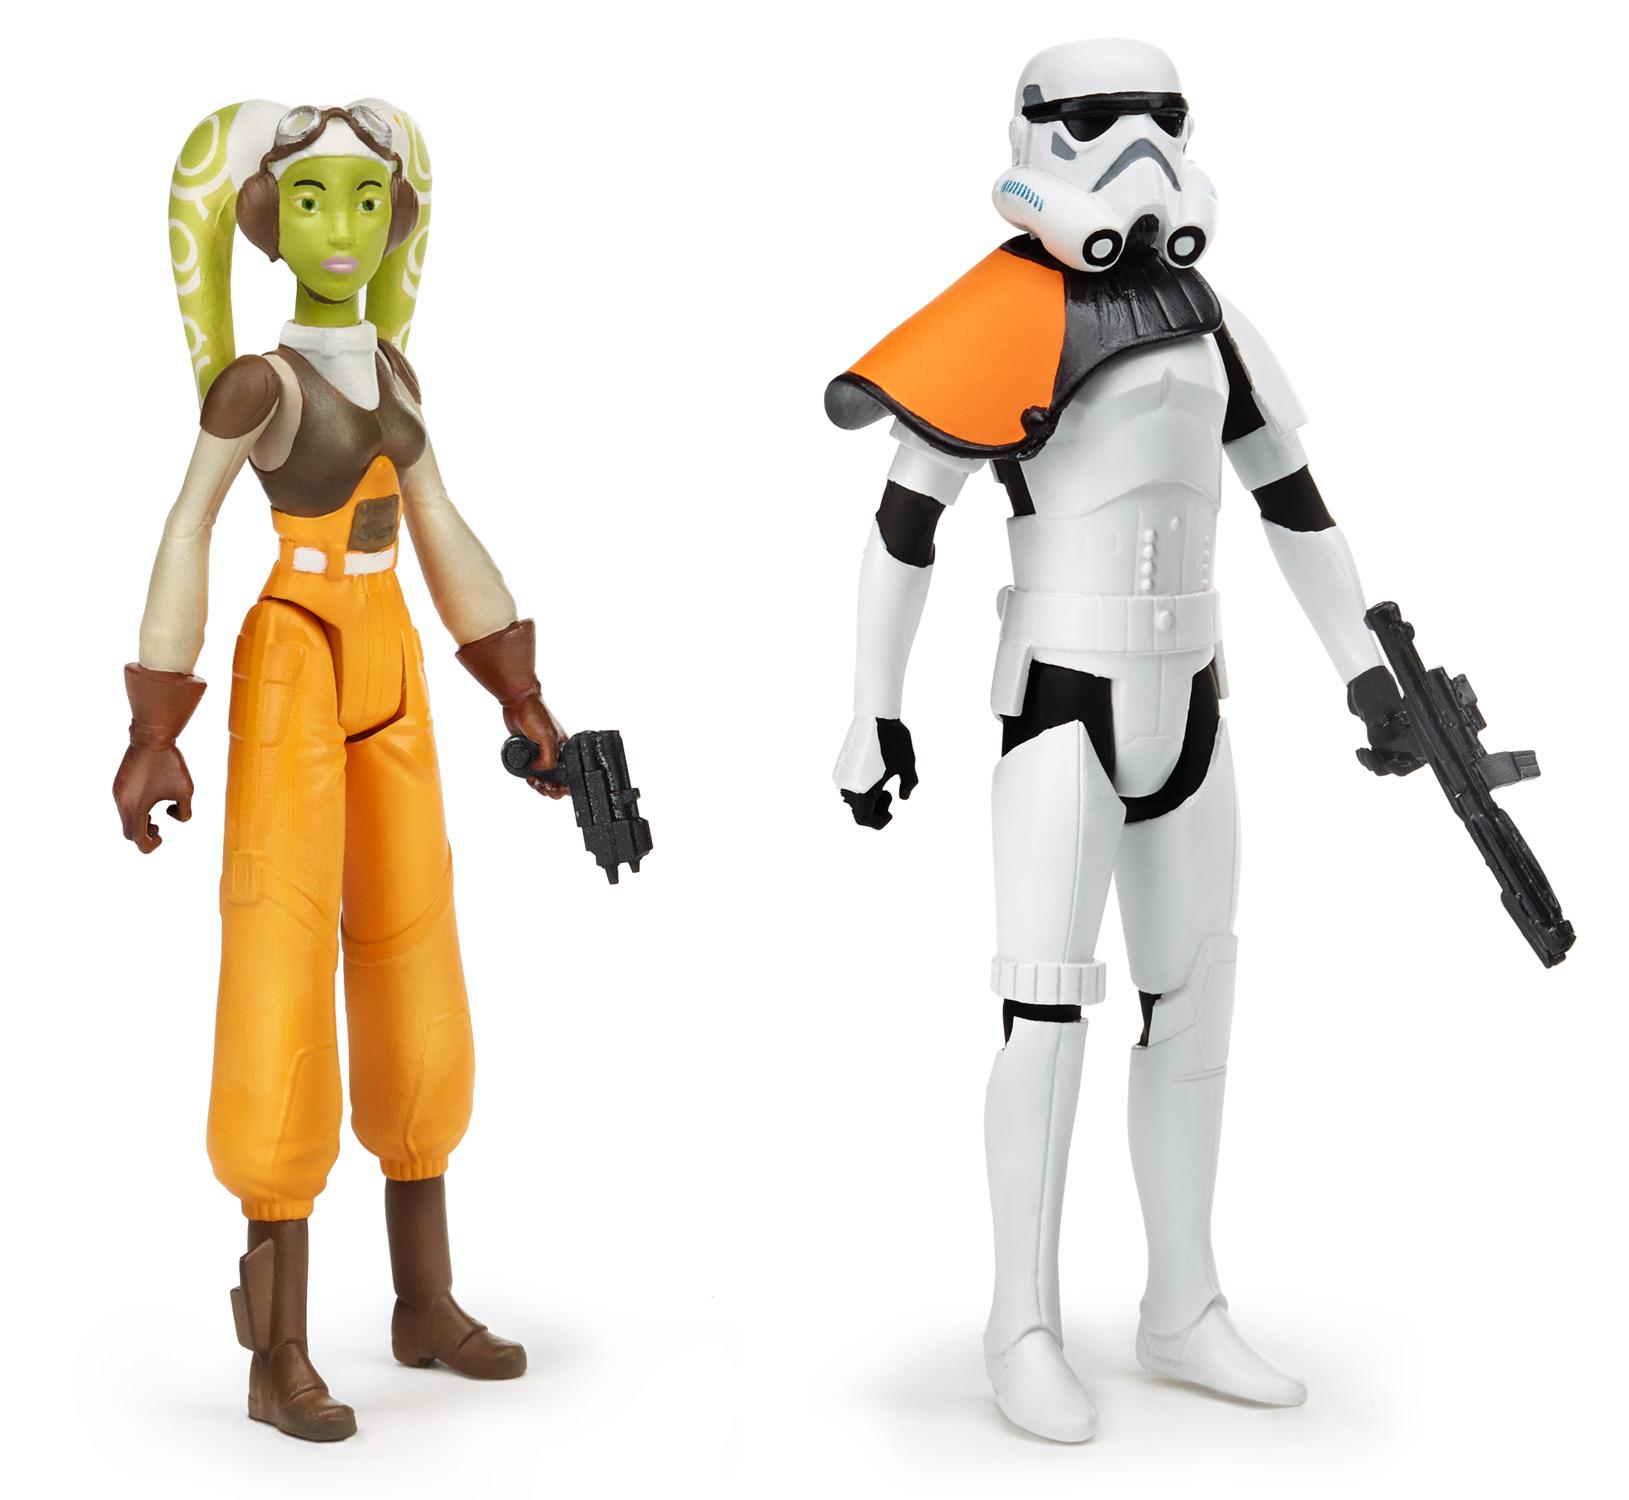 Hera and Stormtrooper commander figures.jpg  sc 1 st  Star Wars Rebels Wiki - Fandom & Image - Hera and Stormtrooper commander figures.jpg | Star Wars ...